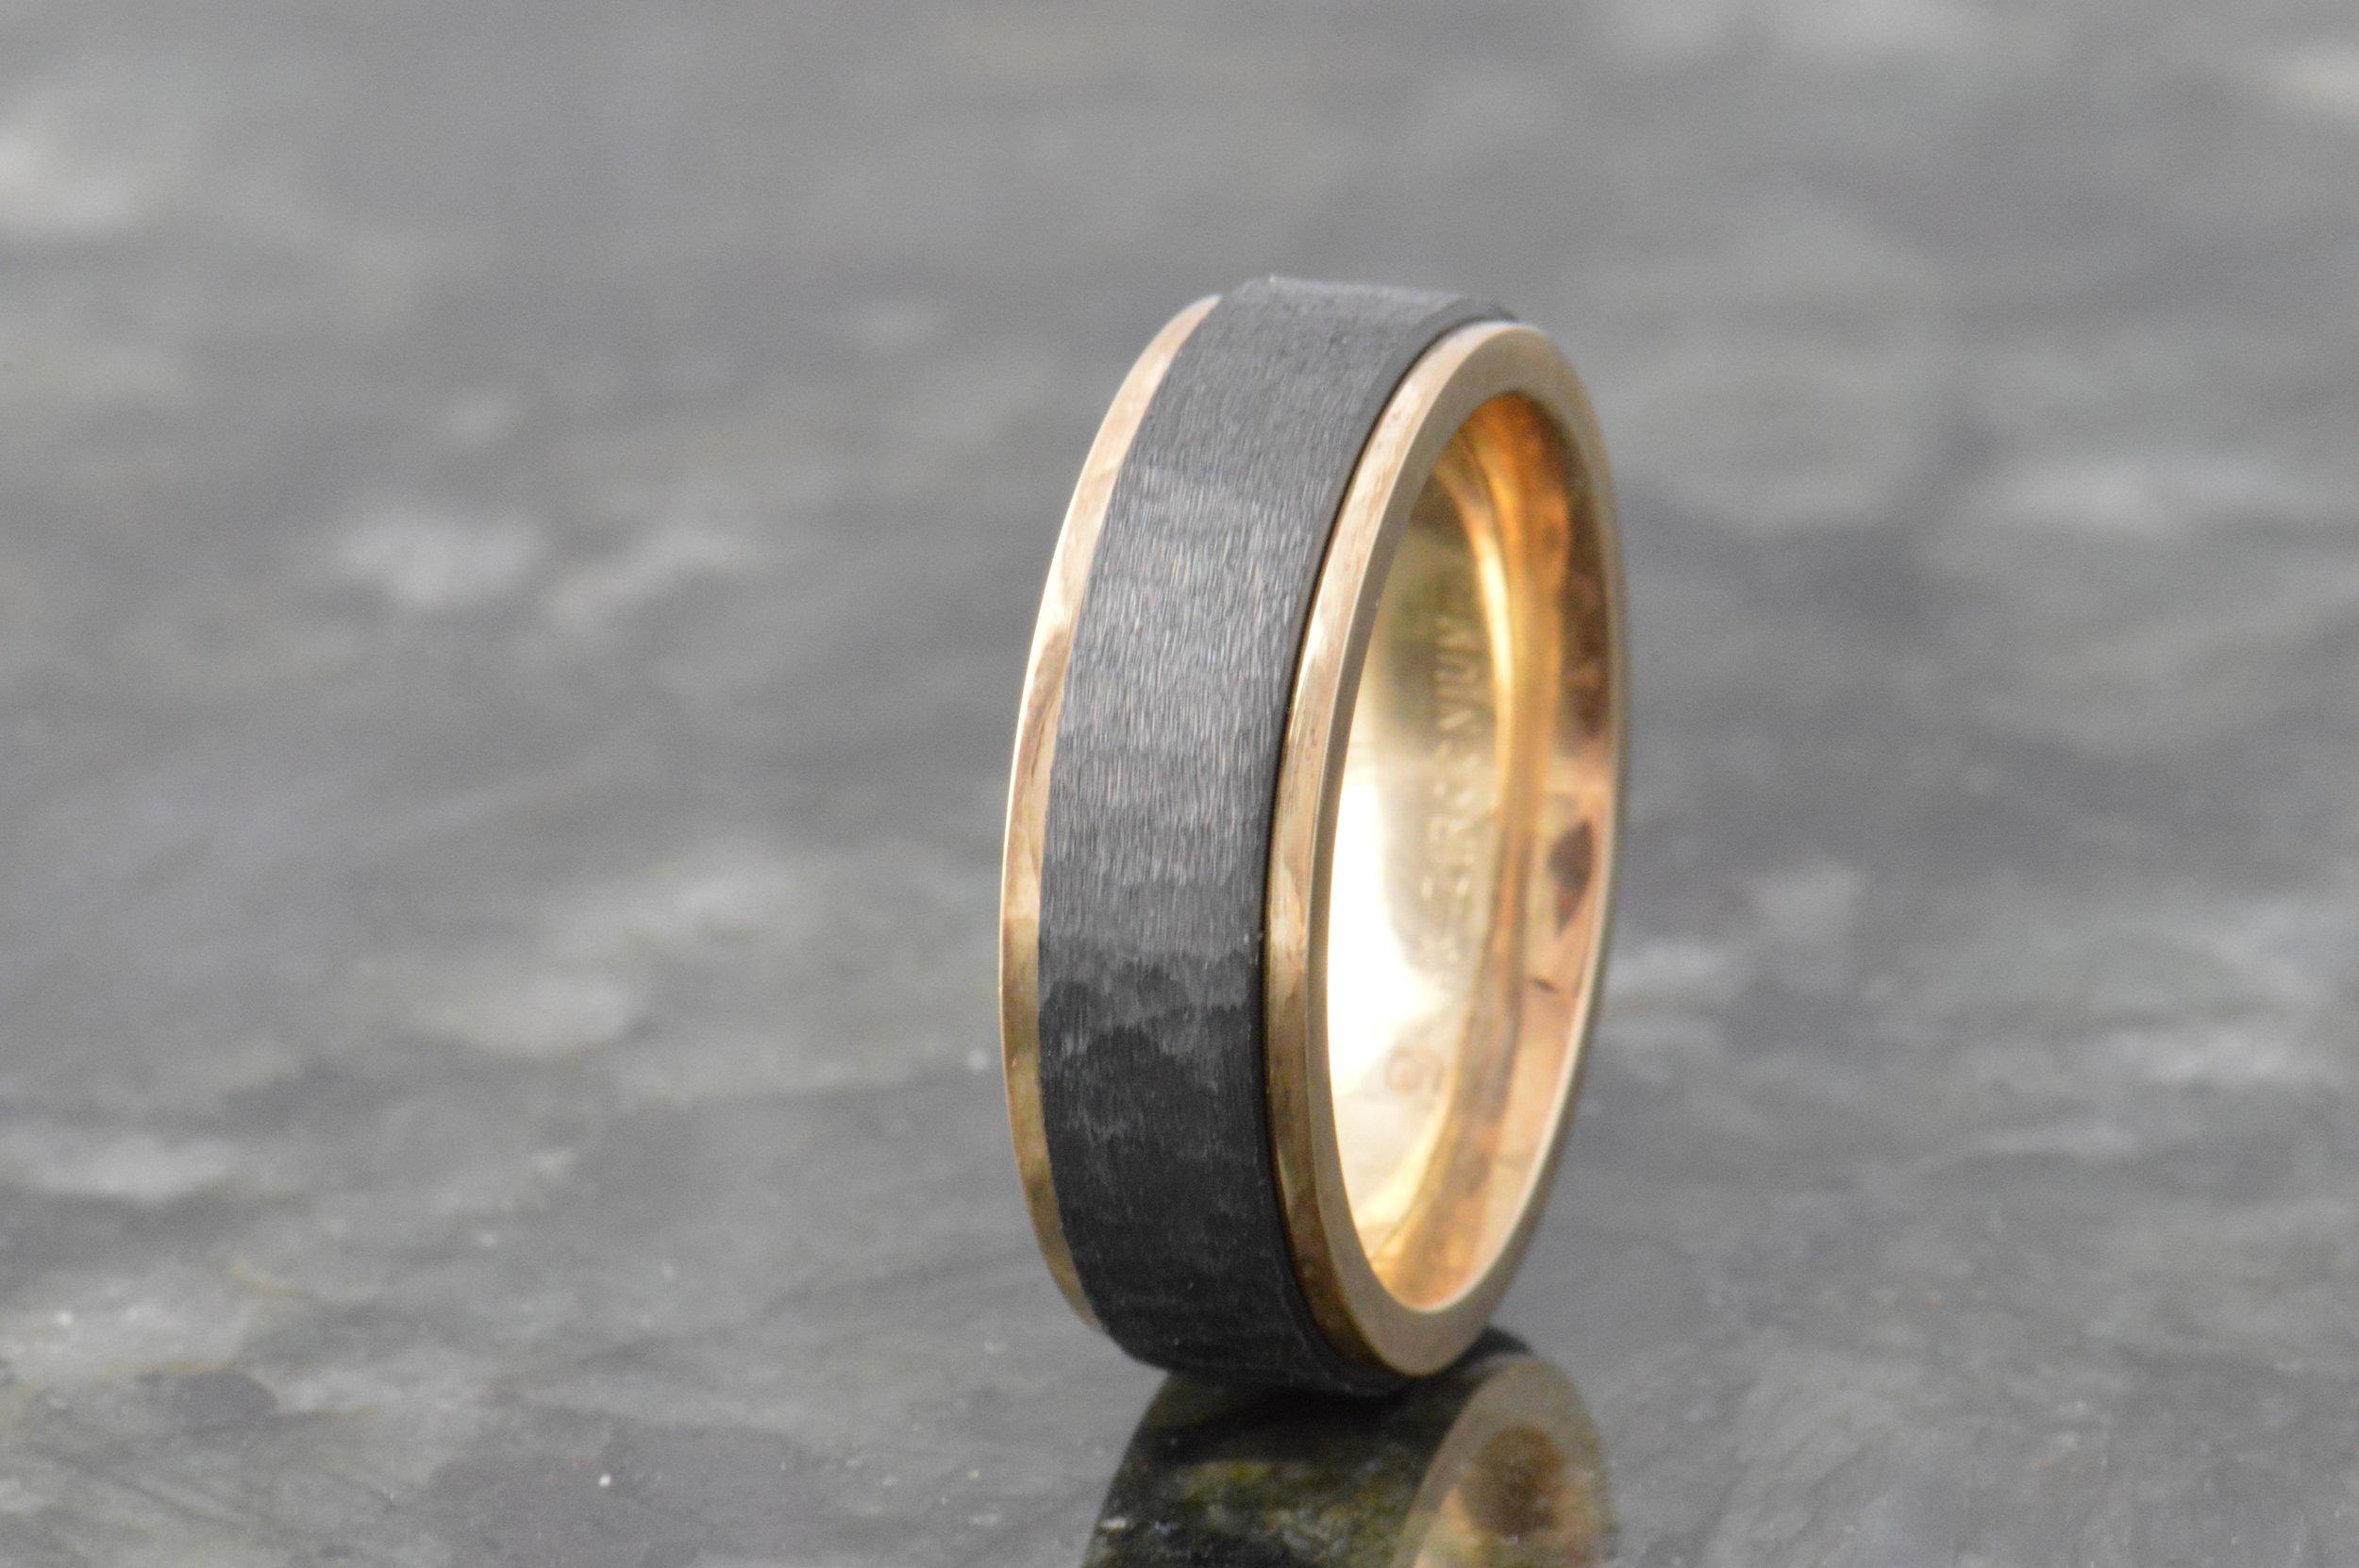 darvier-zirconium-14k-gold-wedding-band-brushed-hammer-finish.JPG